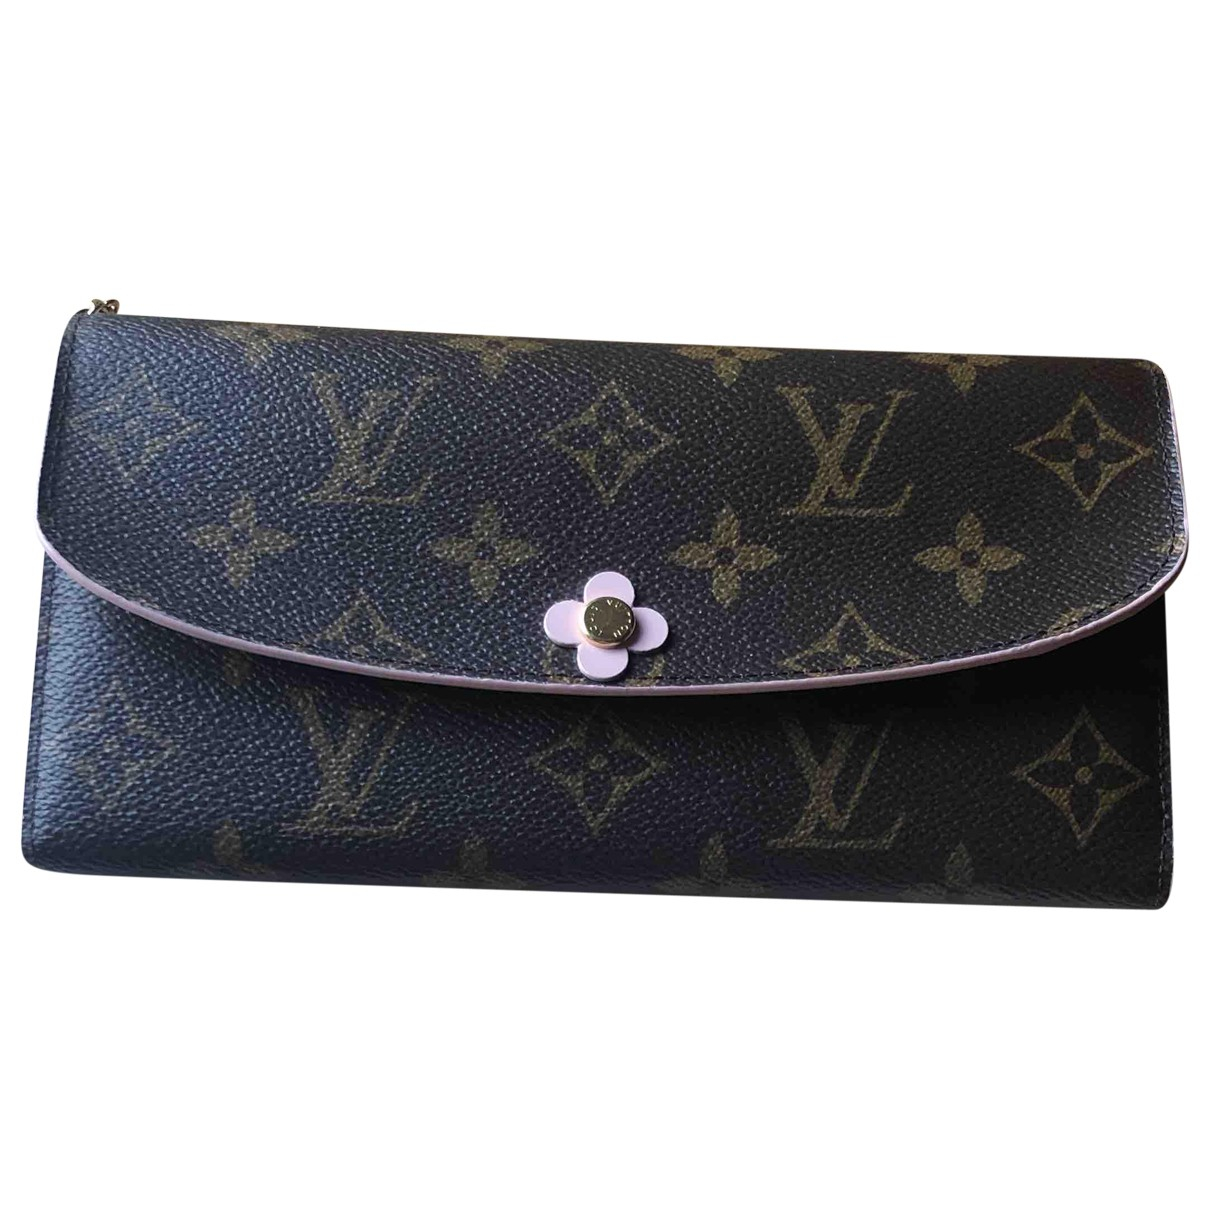 Cartera Emilie de Lona Louis Vuitton